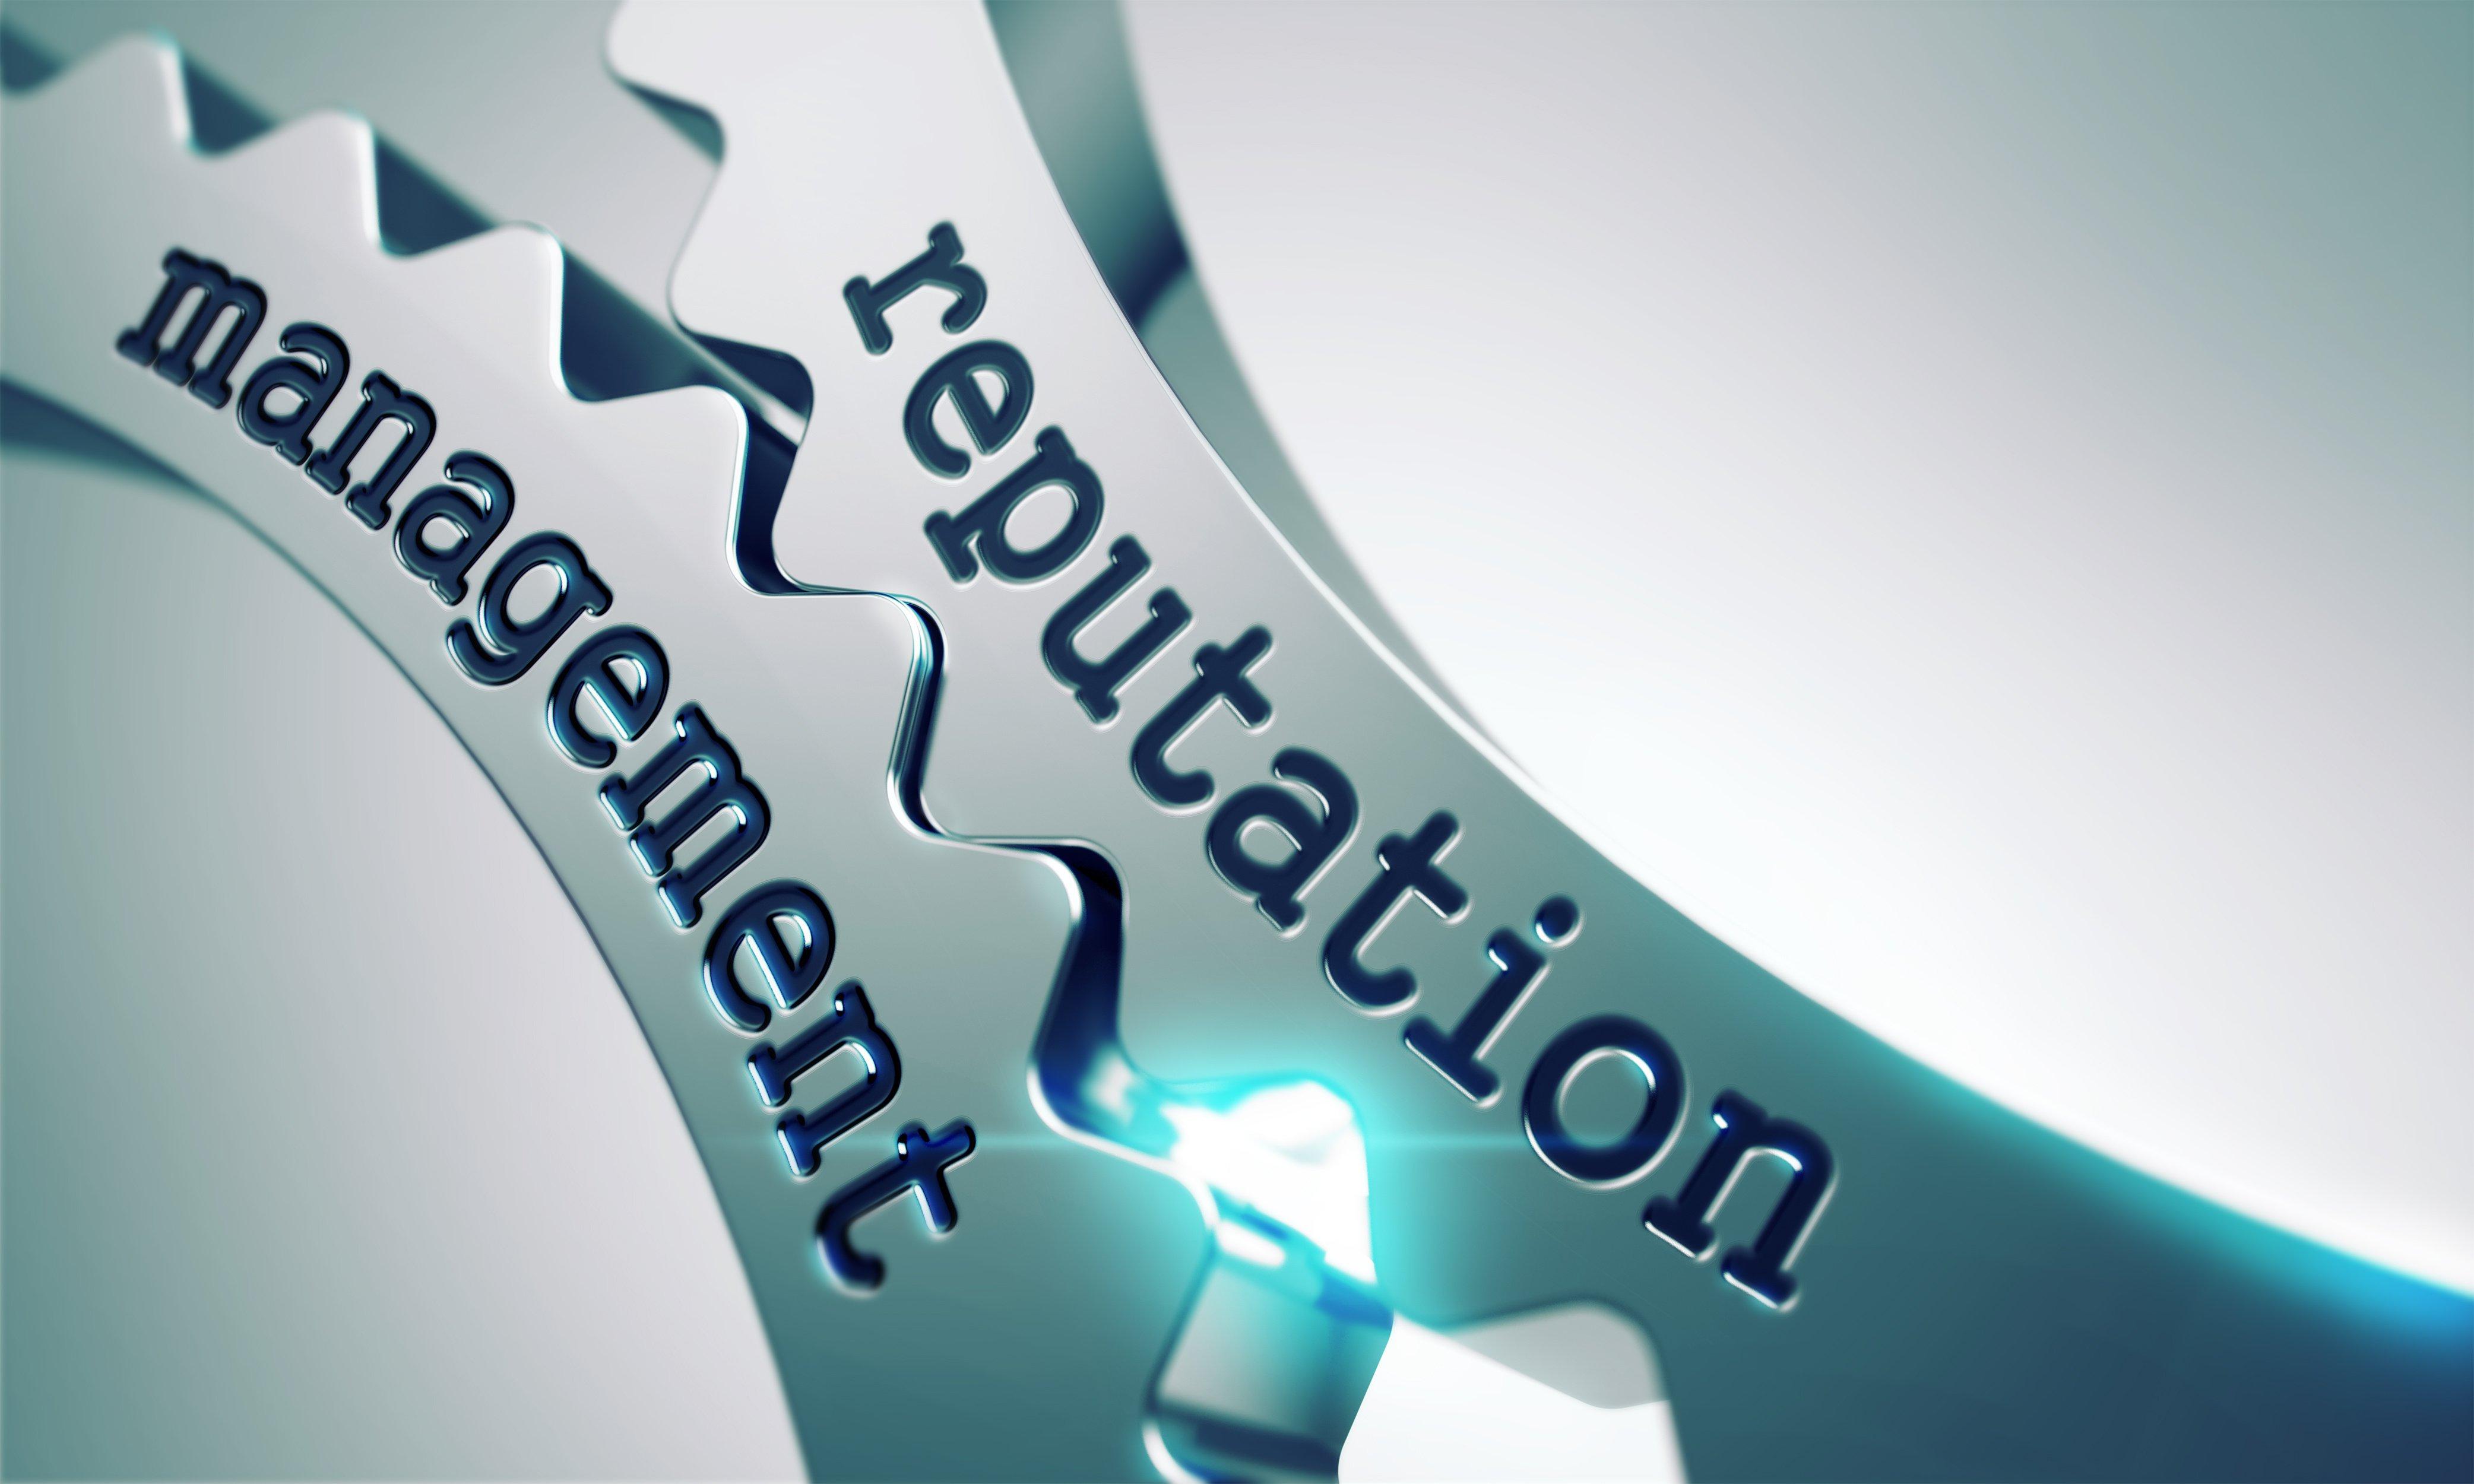 Digital Marketing Photo #5 -- Reputation Management